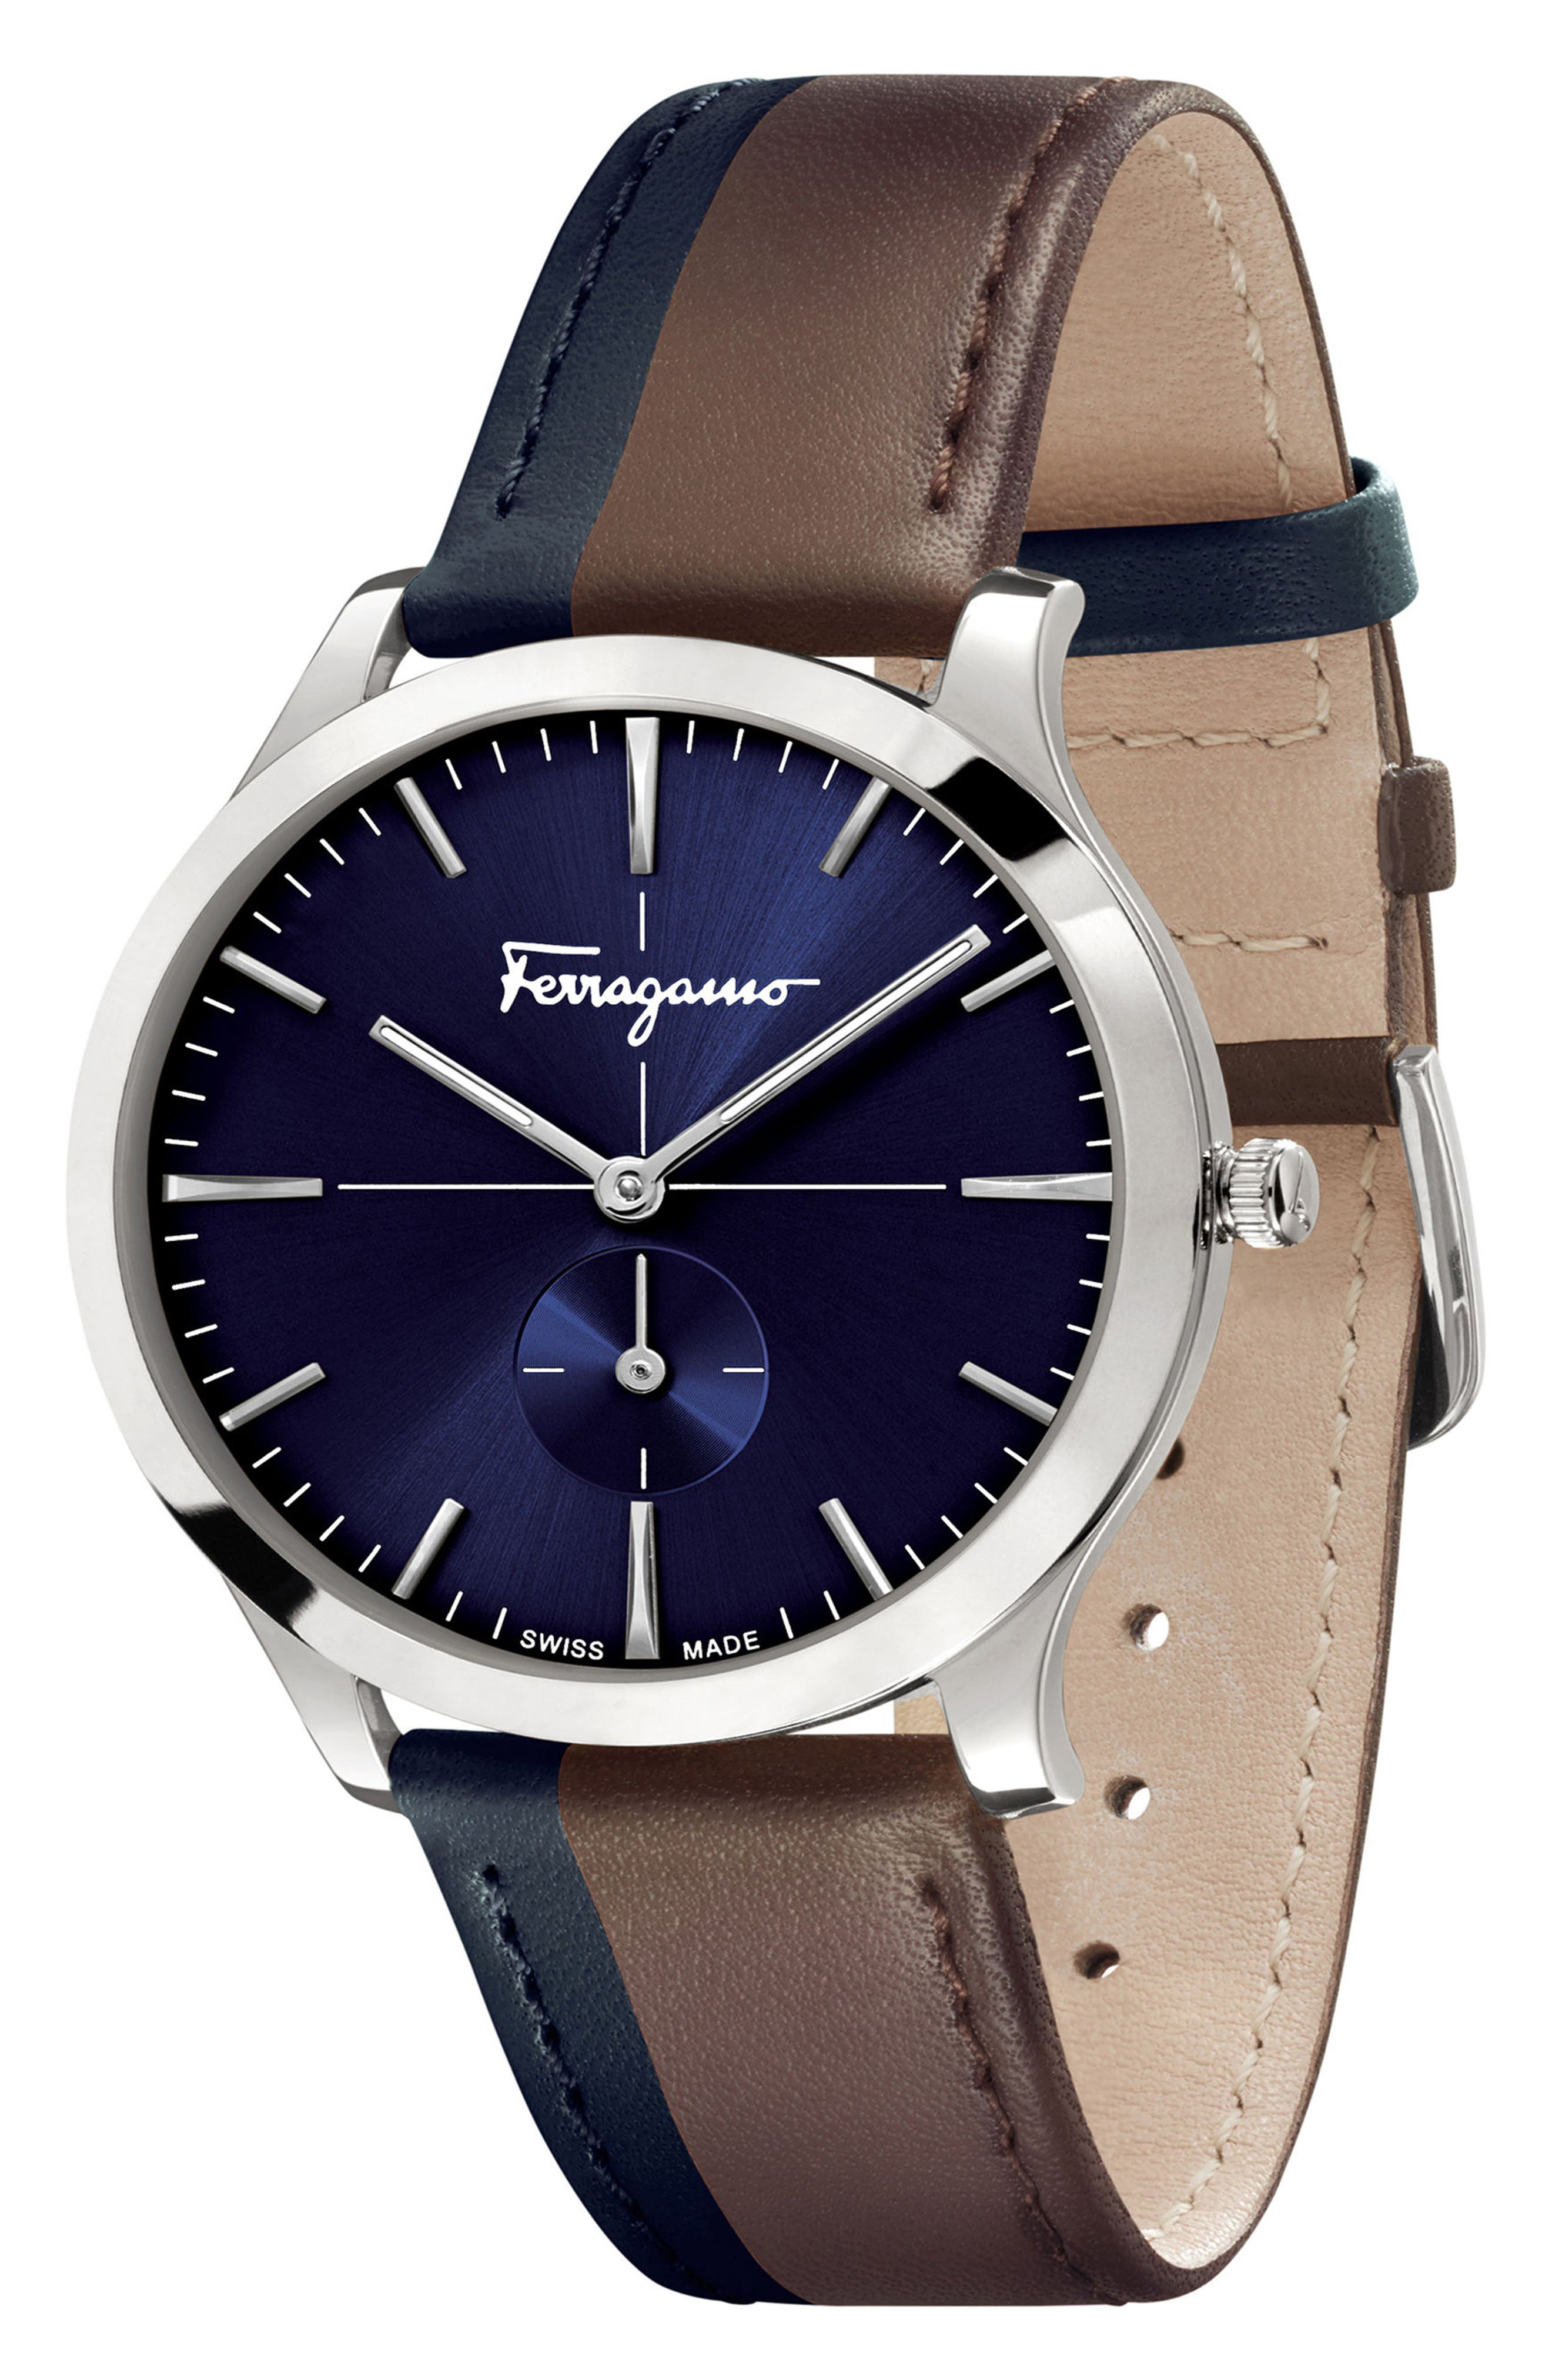 SALVATORE FERRAGAMO,                             Slim Formal Leather Strap Watch, 40mm,                             Alternate thumbnail 4, color,                             200